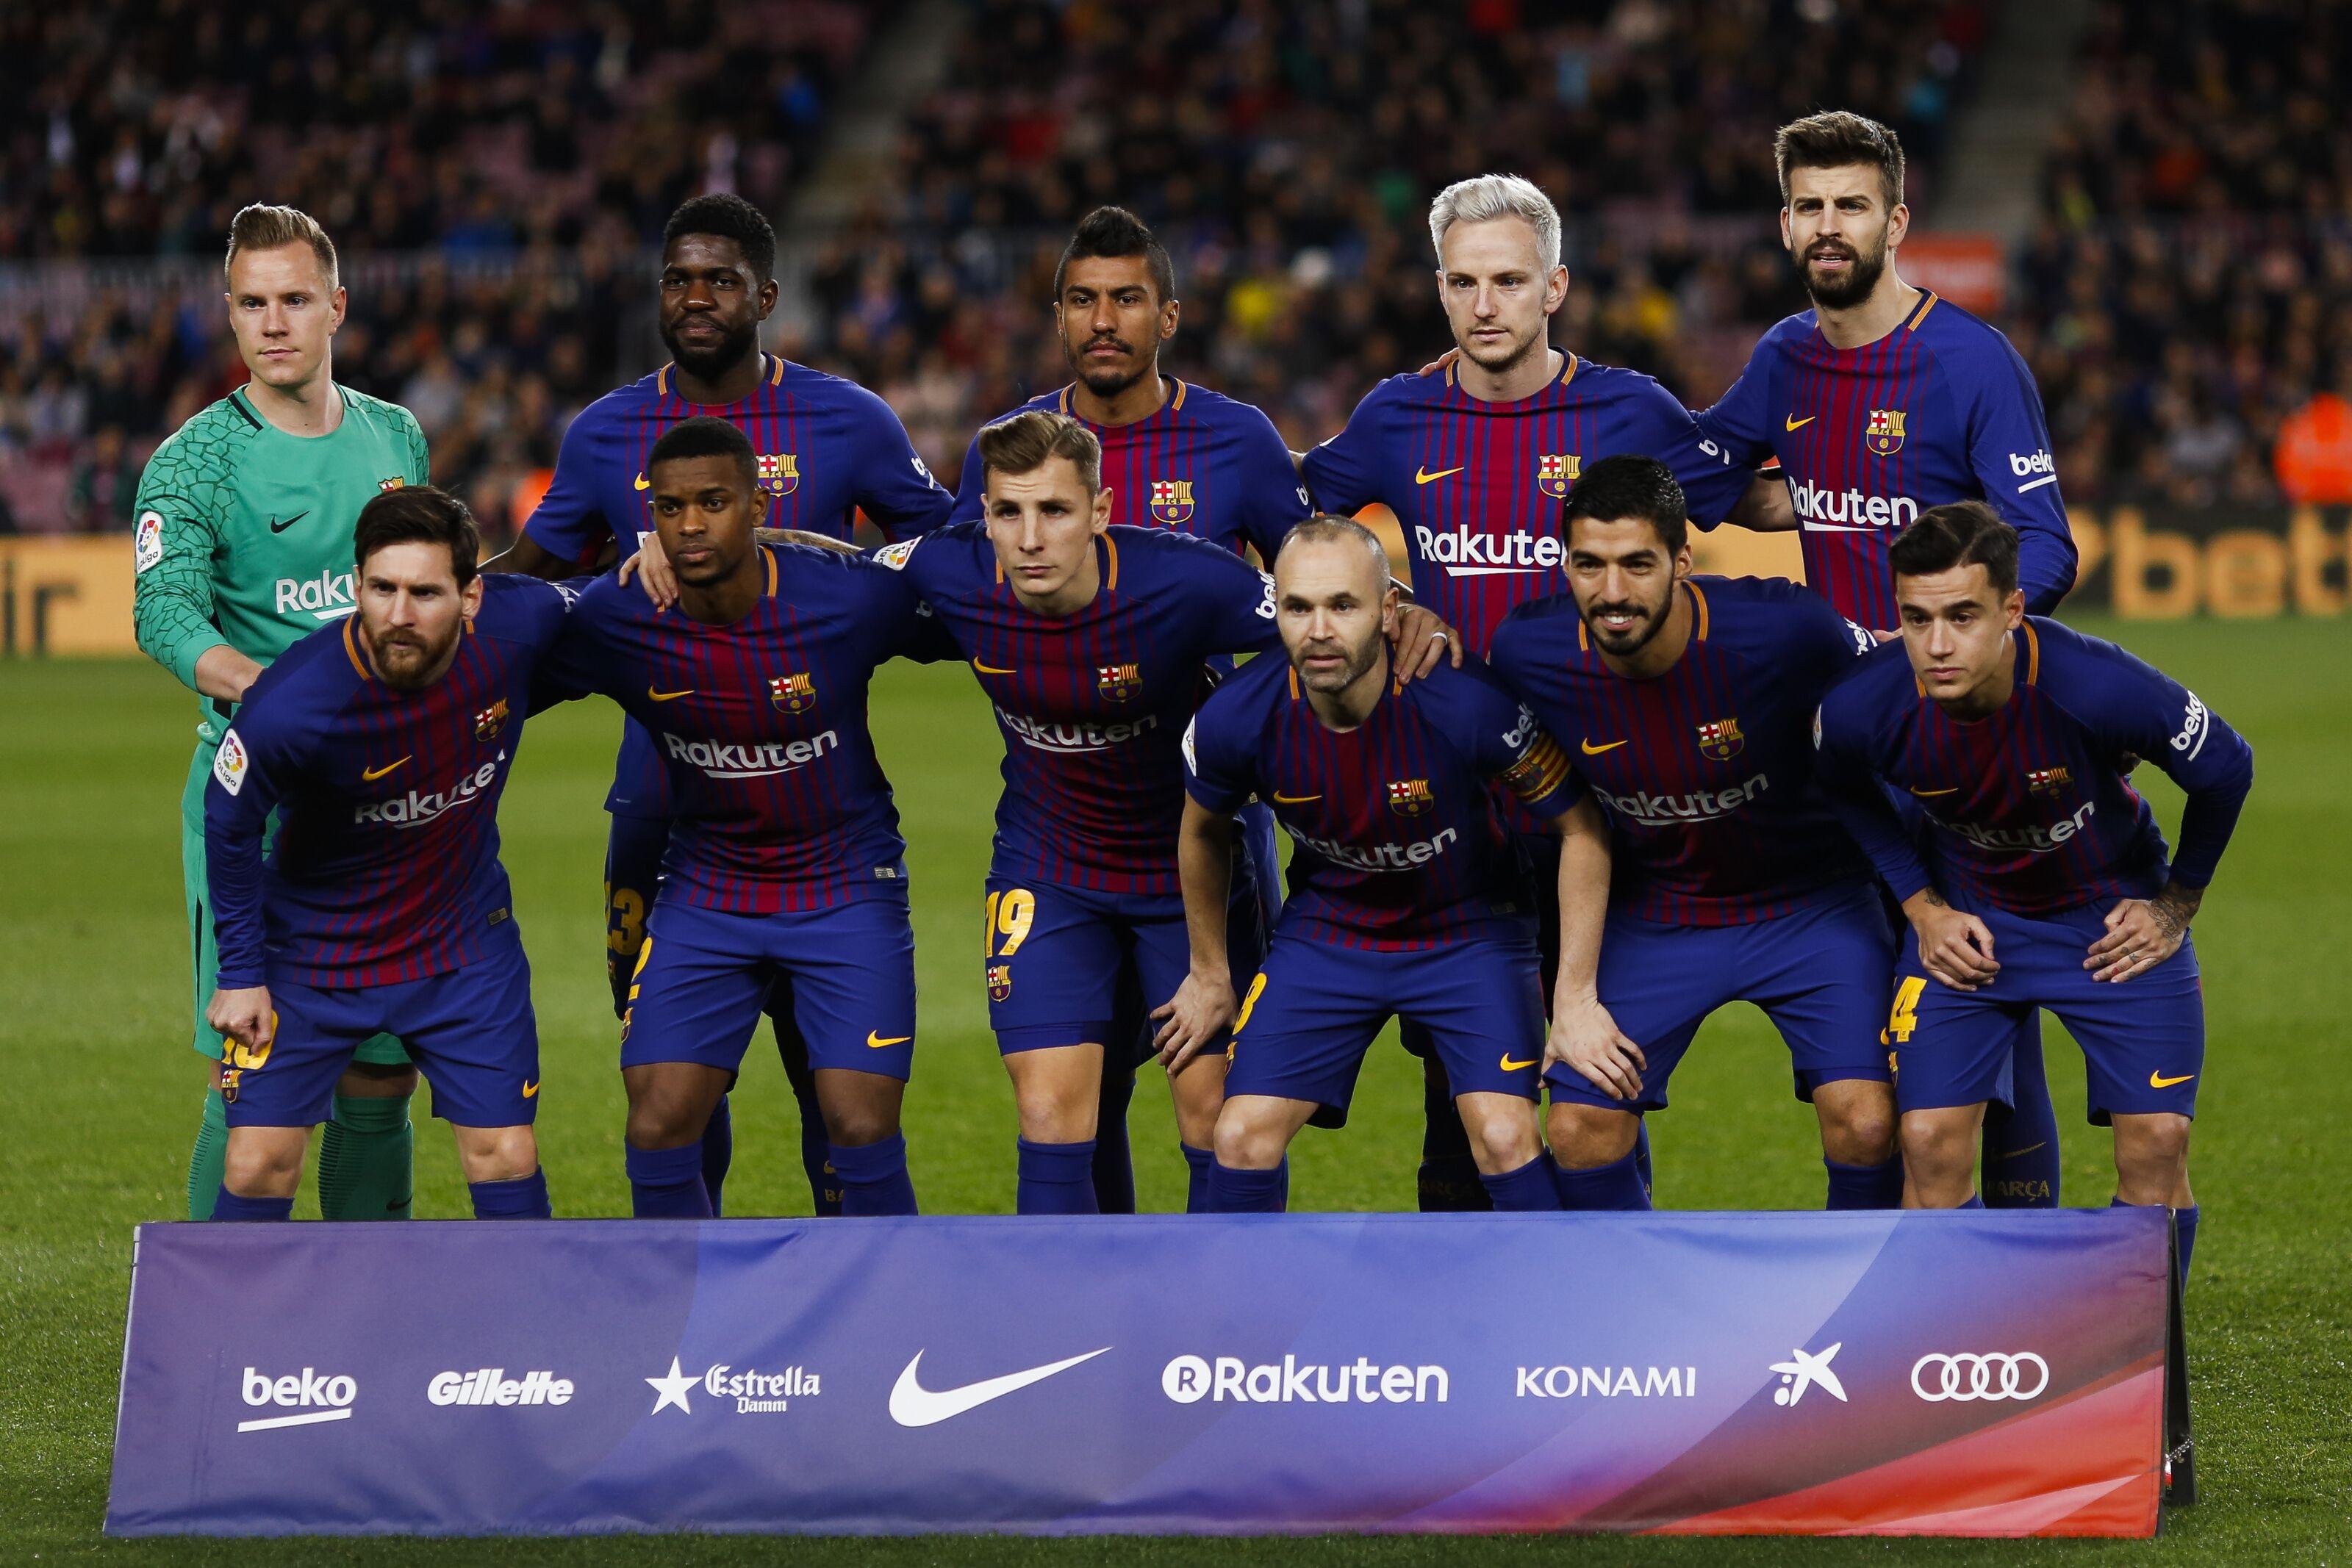 Barcelona La Liga Fixtures Released For The 2018 19 Season